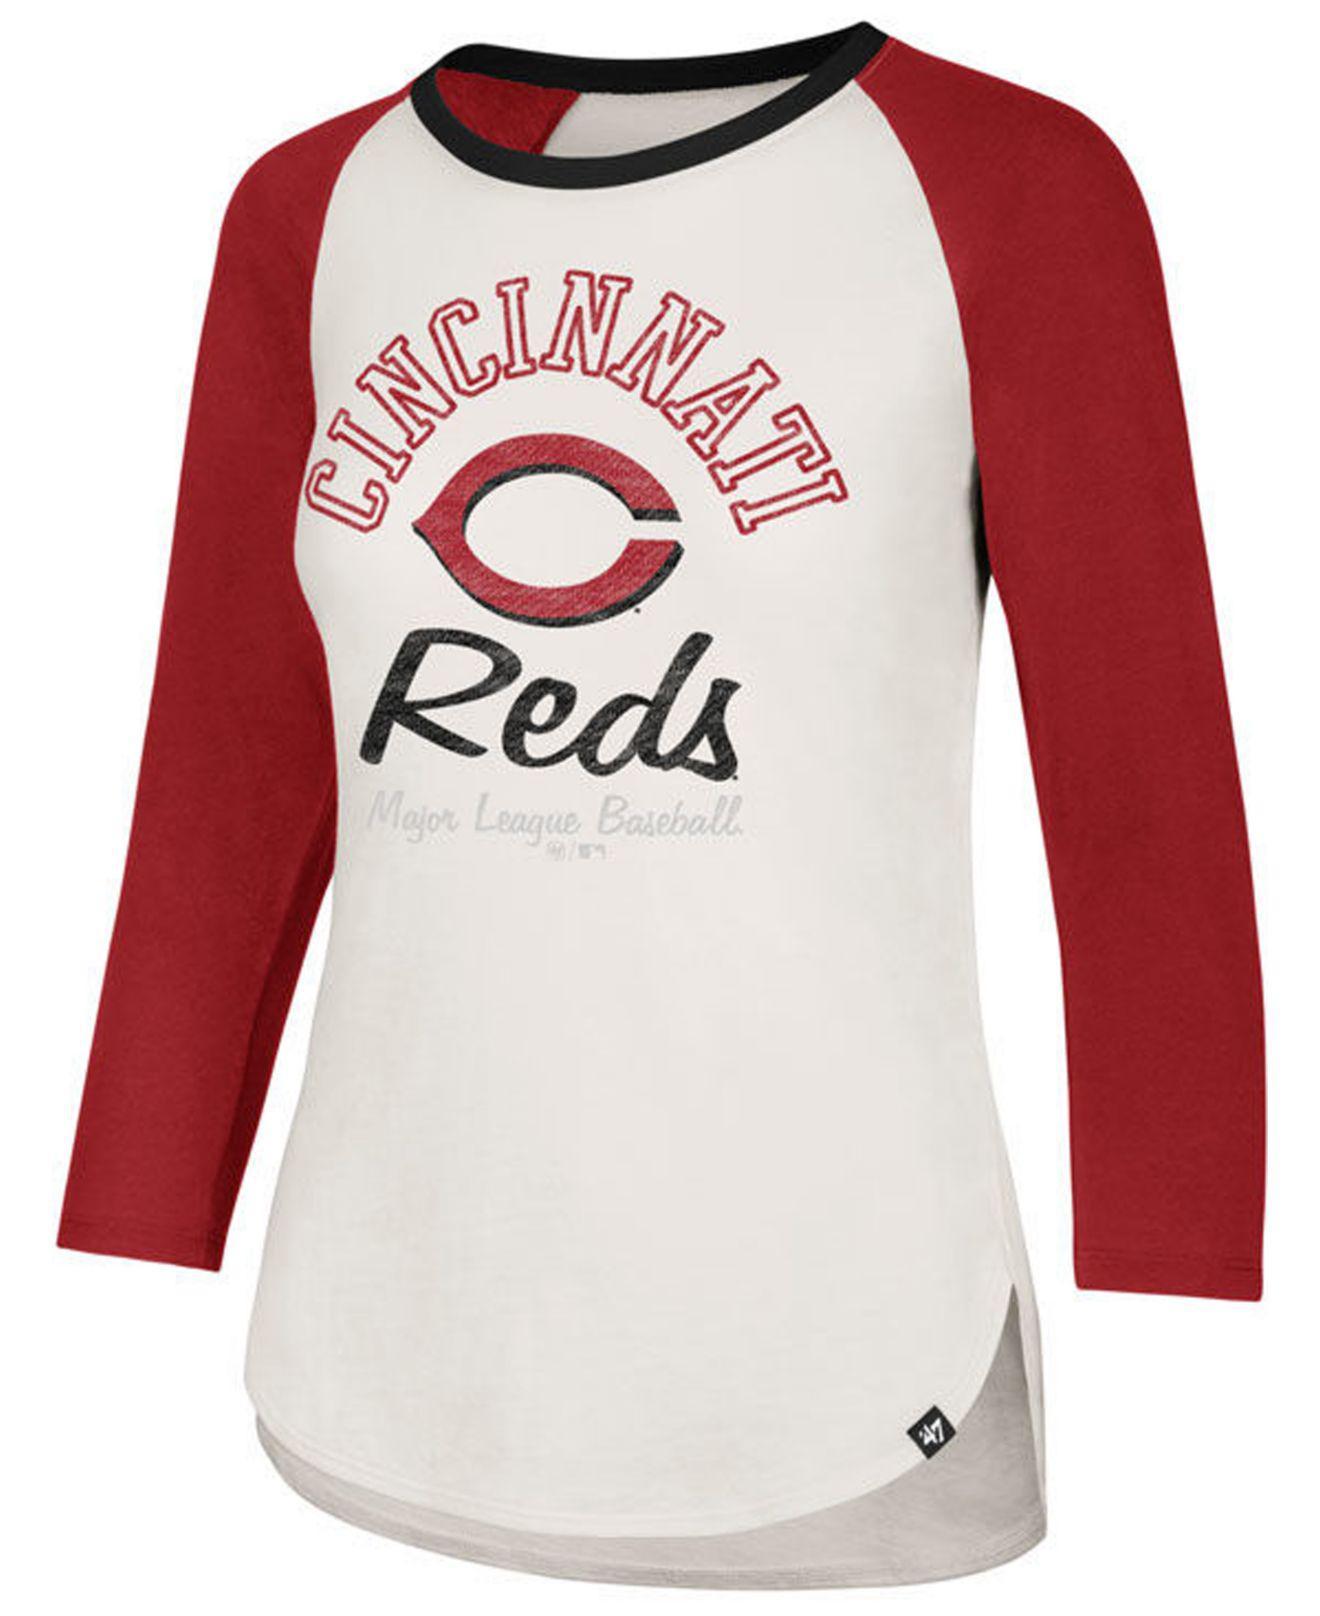 b5fcc9fe 47 Brand Cincinnati Reds Vintage Raglan T-shirt in Red - Save 29% - Lyst